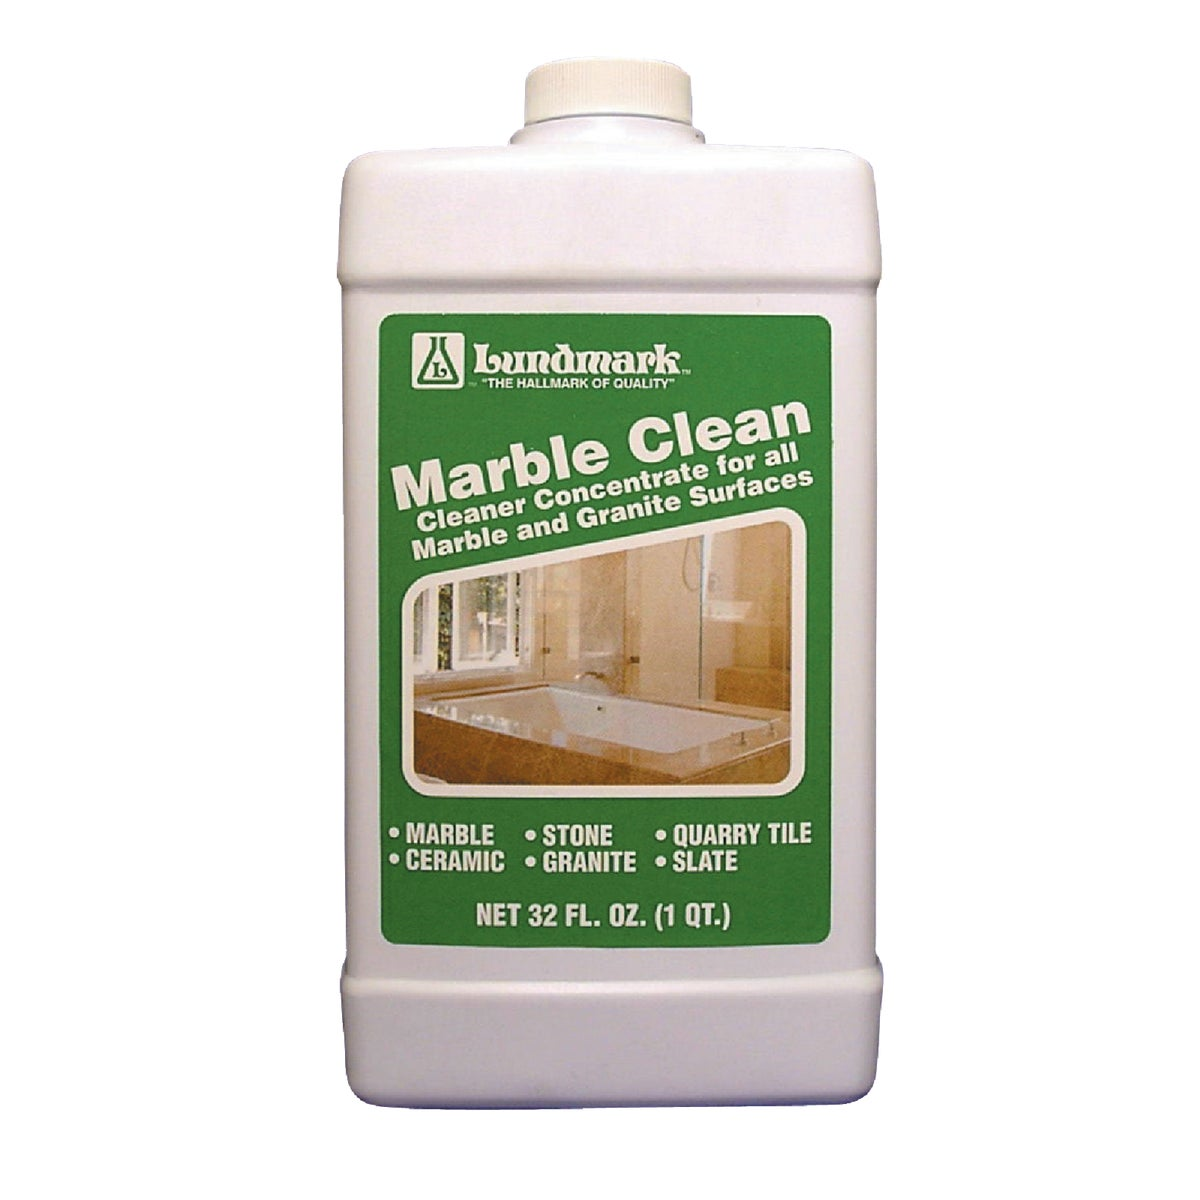 Marble Clean